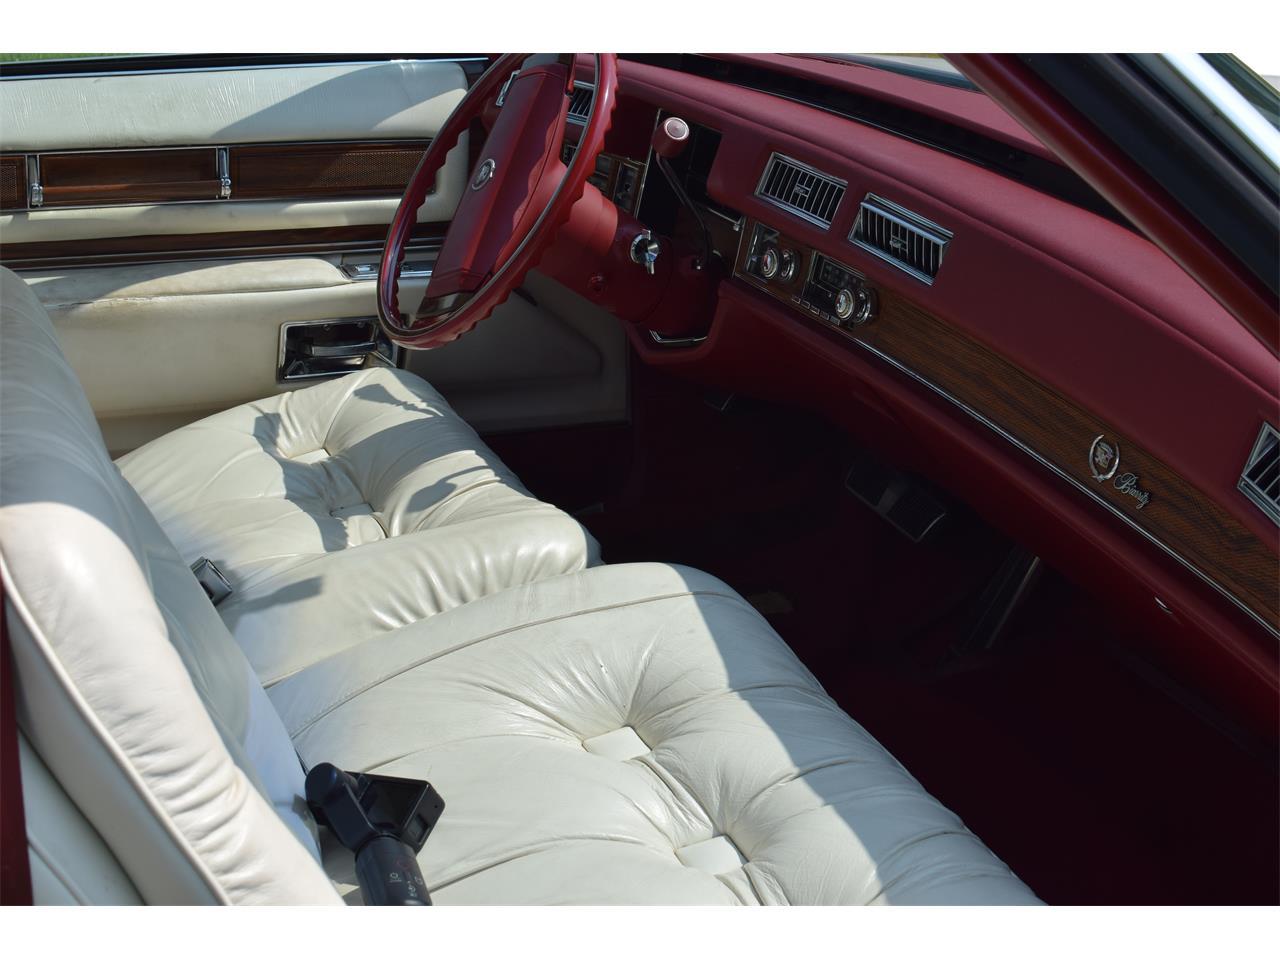 1978 Cadillac 2-Dr Sedan (CC-1384324) for sale in Watertown, Minnesota